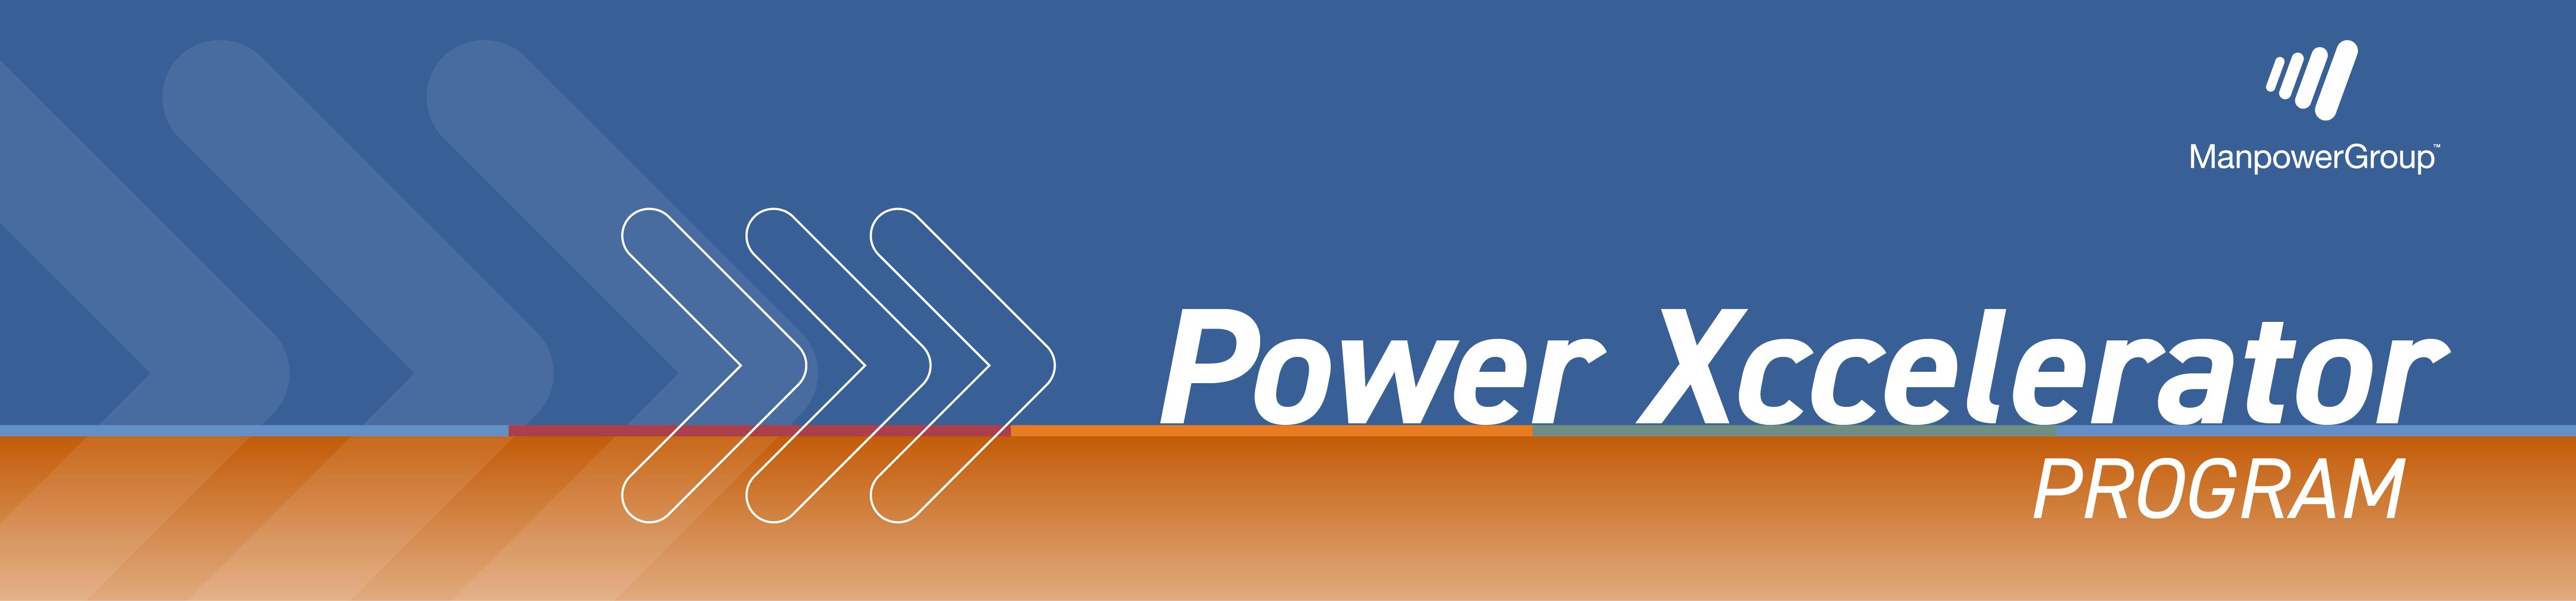 Power Xccelerator Program